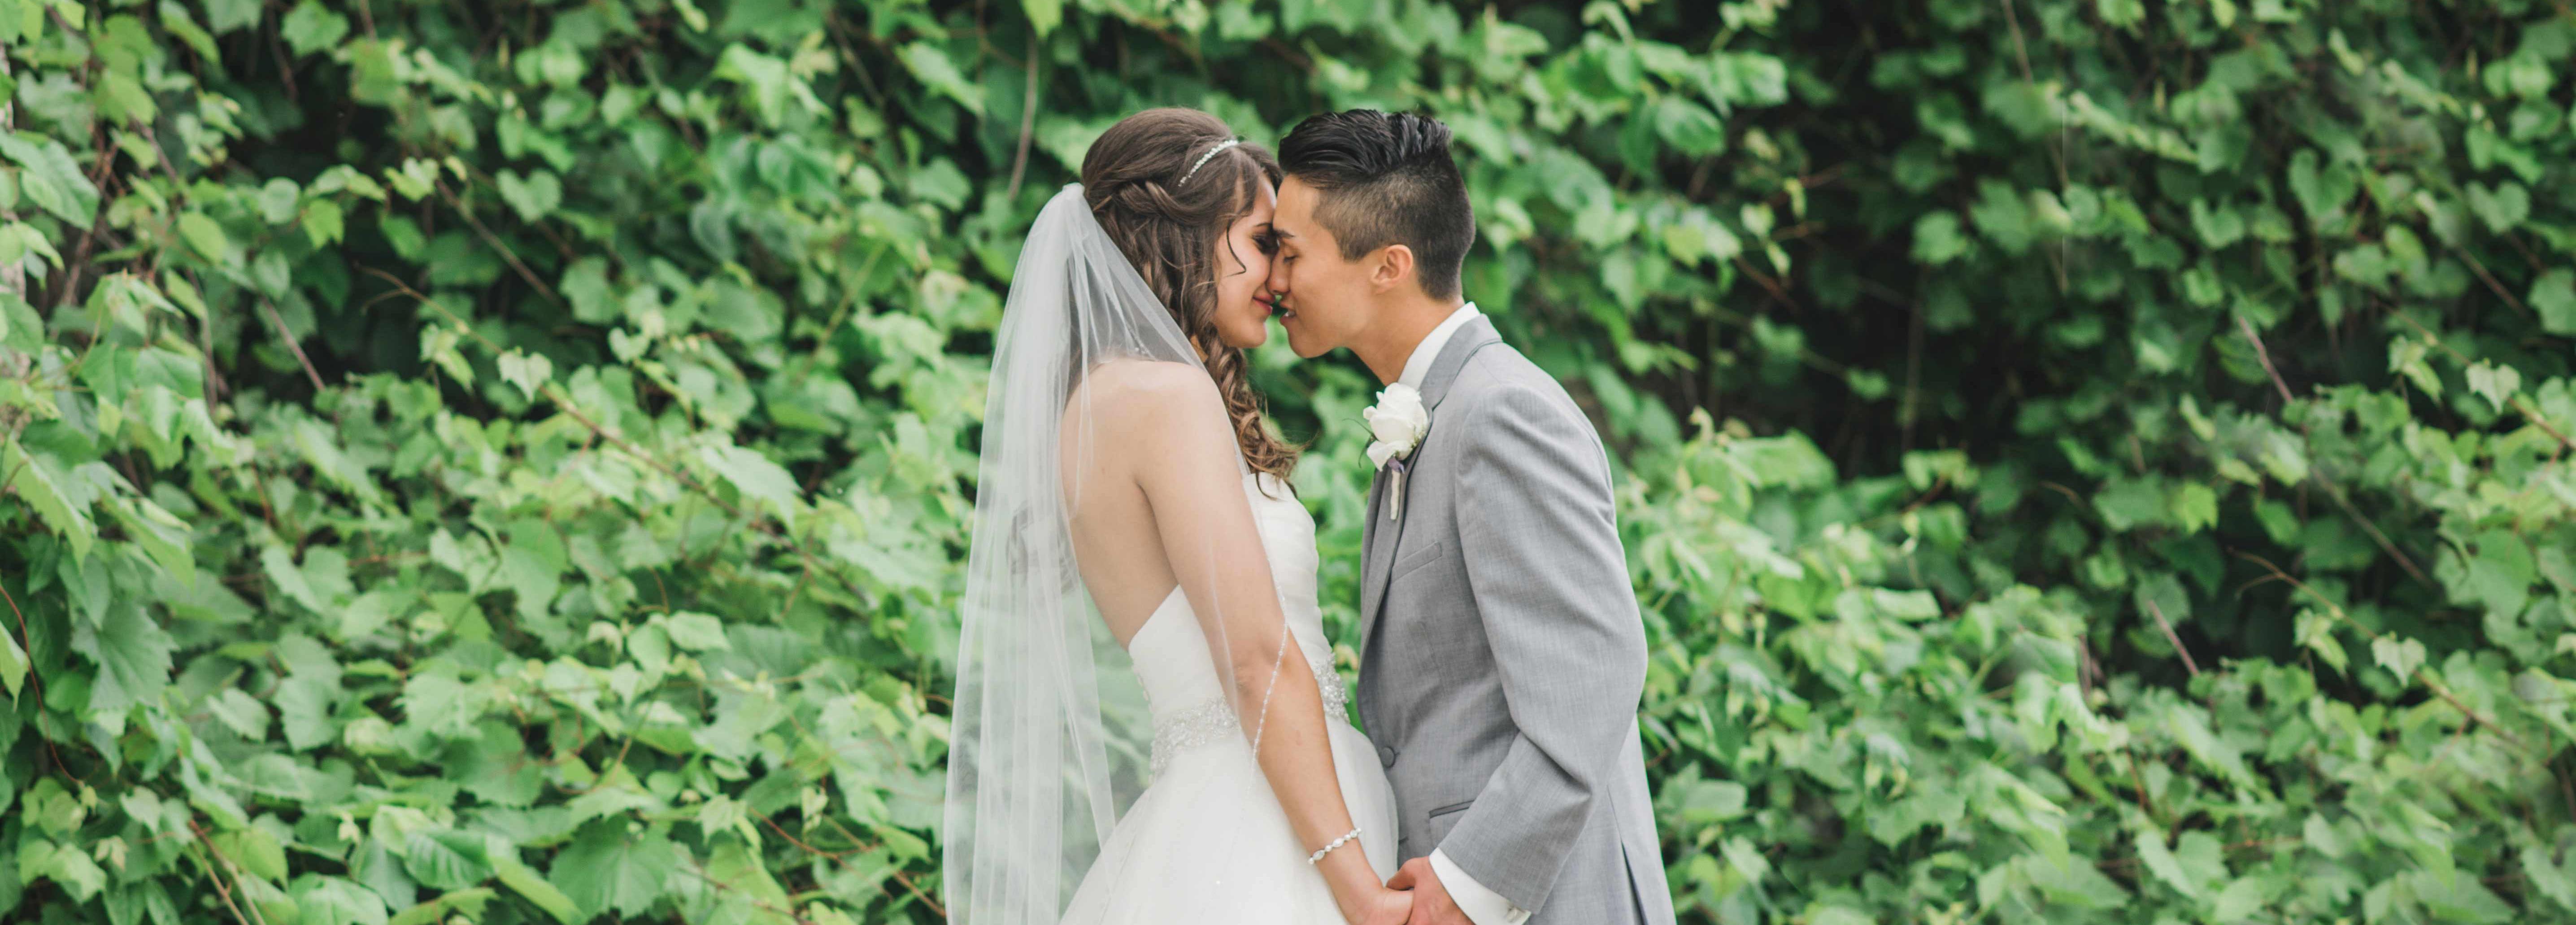 jamie orr photography cedar rapids wedding ENGAGEMENT photographer